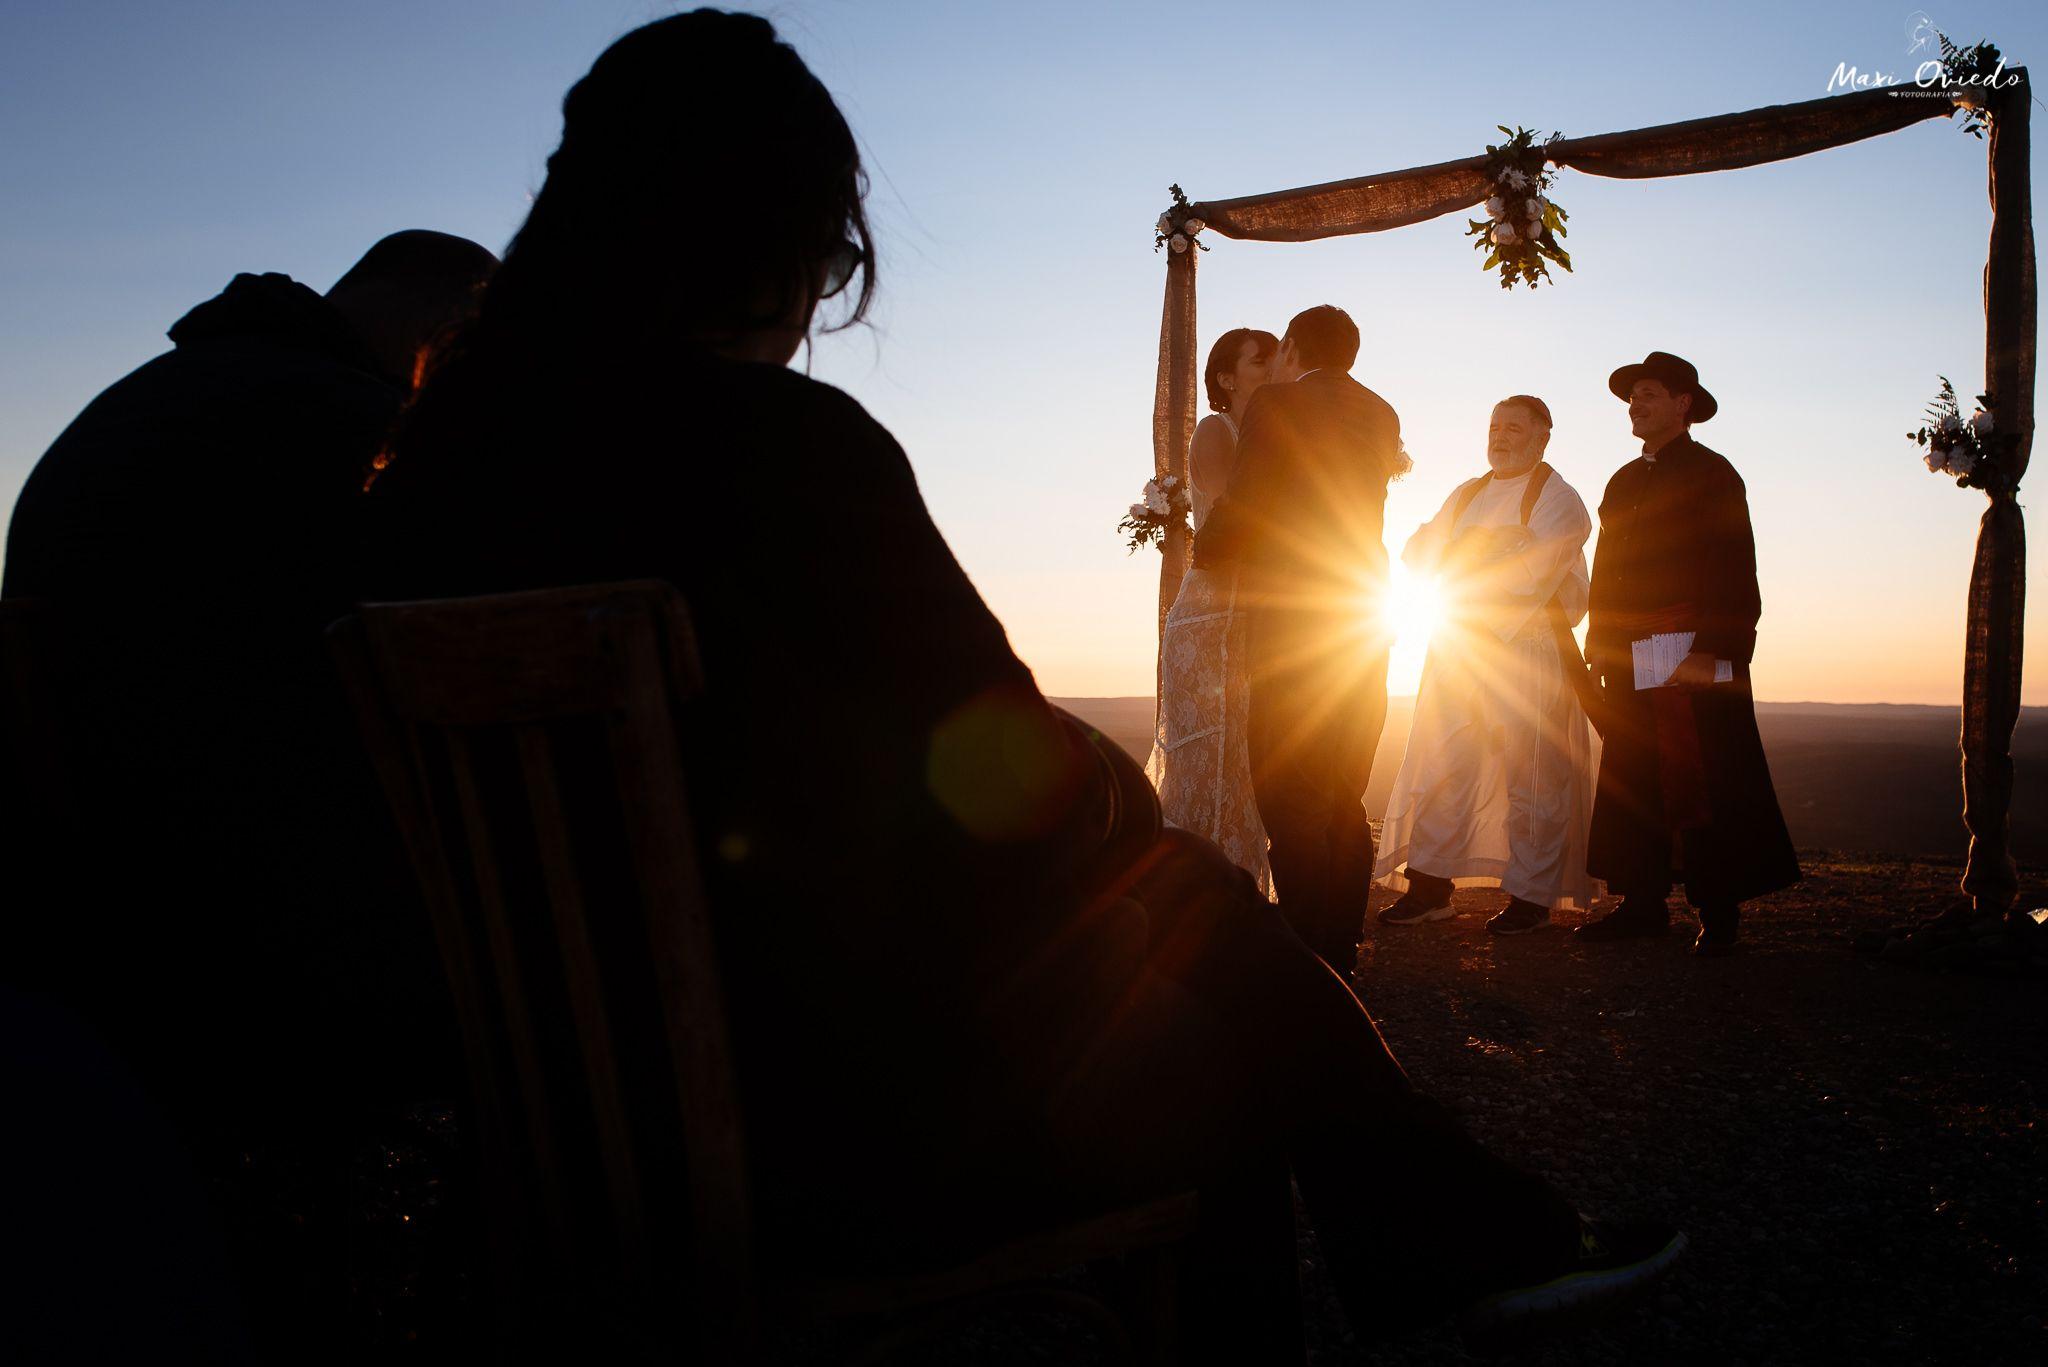 boda sextuple la cumbre cordoba cuchi corral fotografo de bodas fotografo de casamientos rosario san nicolas argentina vestido de novia ramo de novia-37.jpg